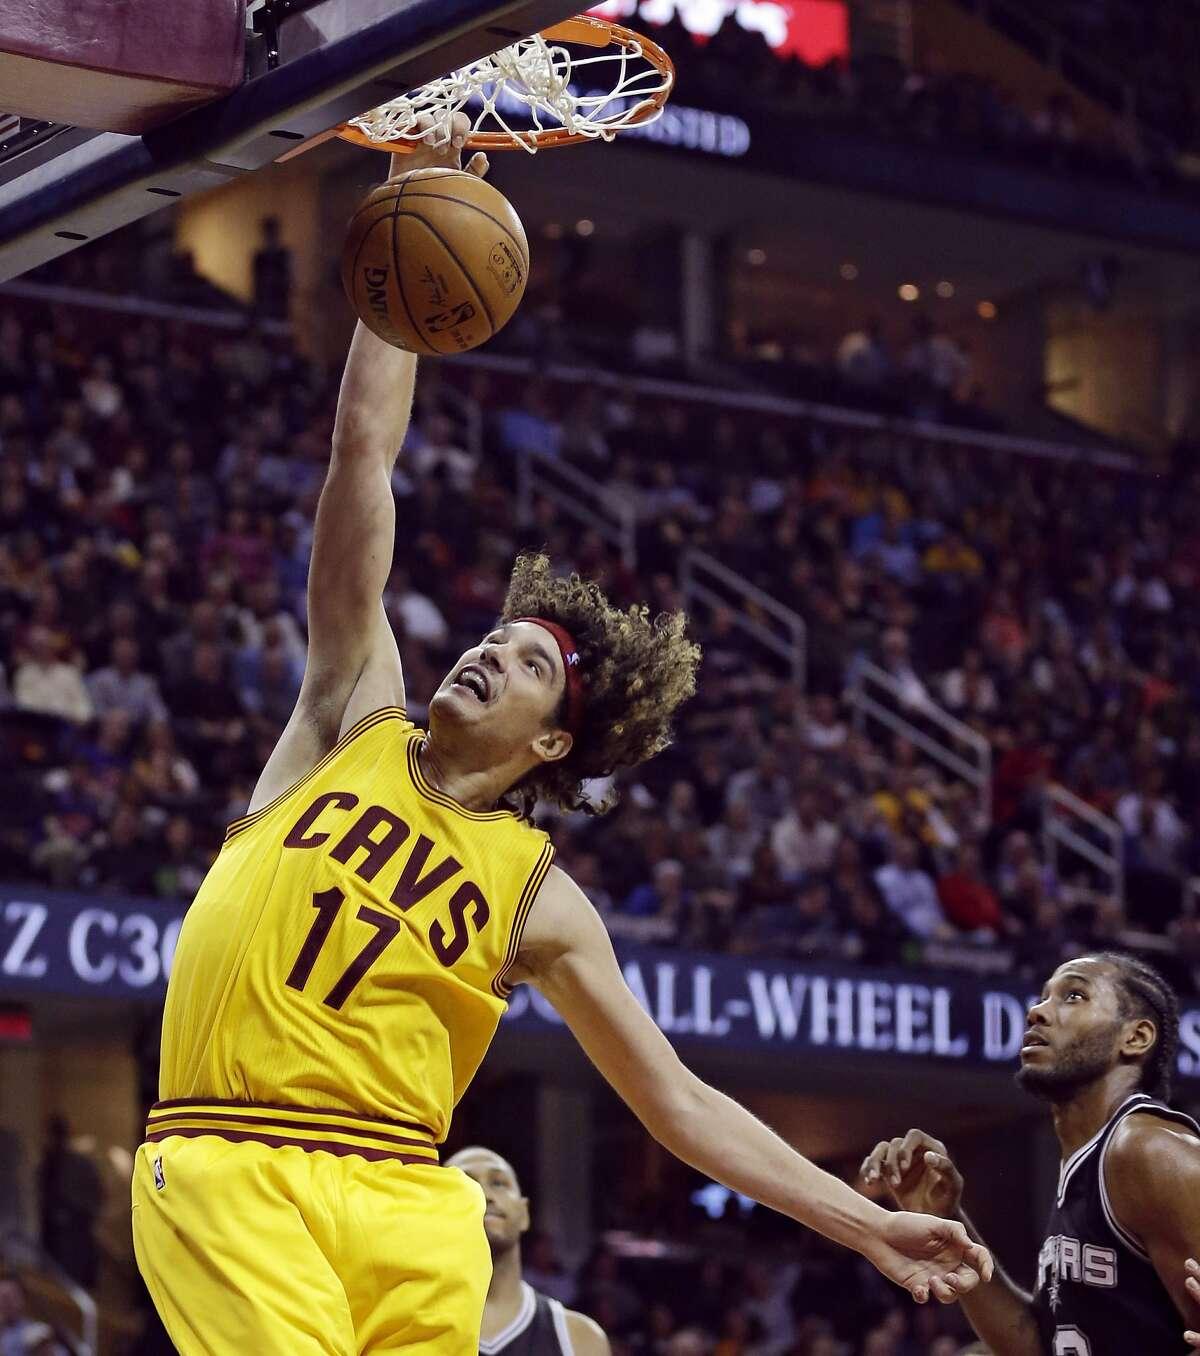 Former Cavaliers center Anderson Varejao dunks against the San Antonio Spurs on Nov. 19, 2014.